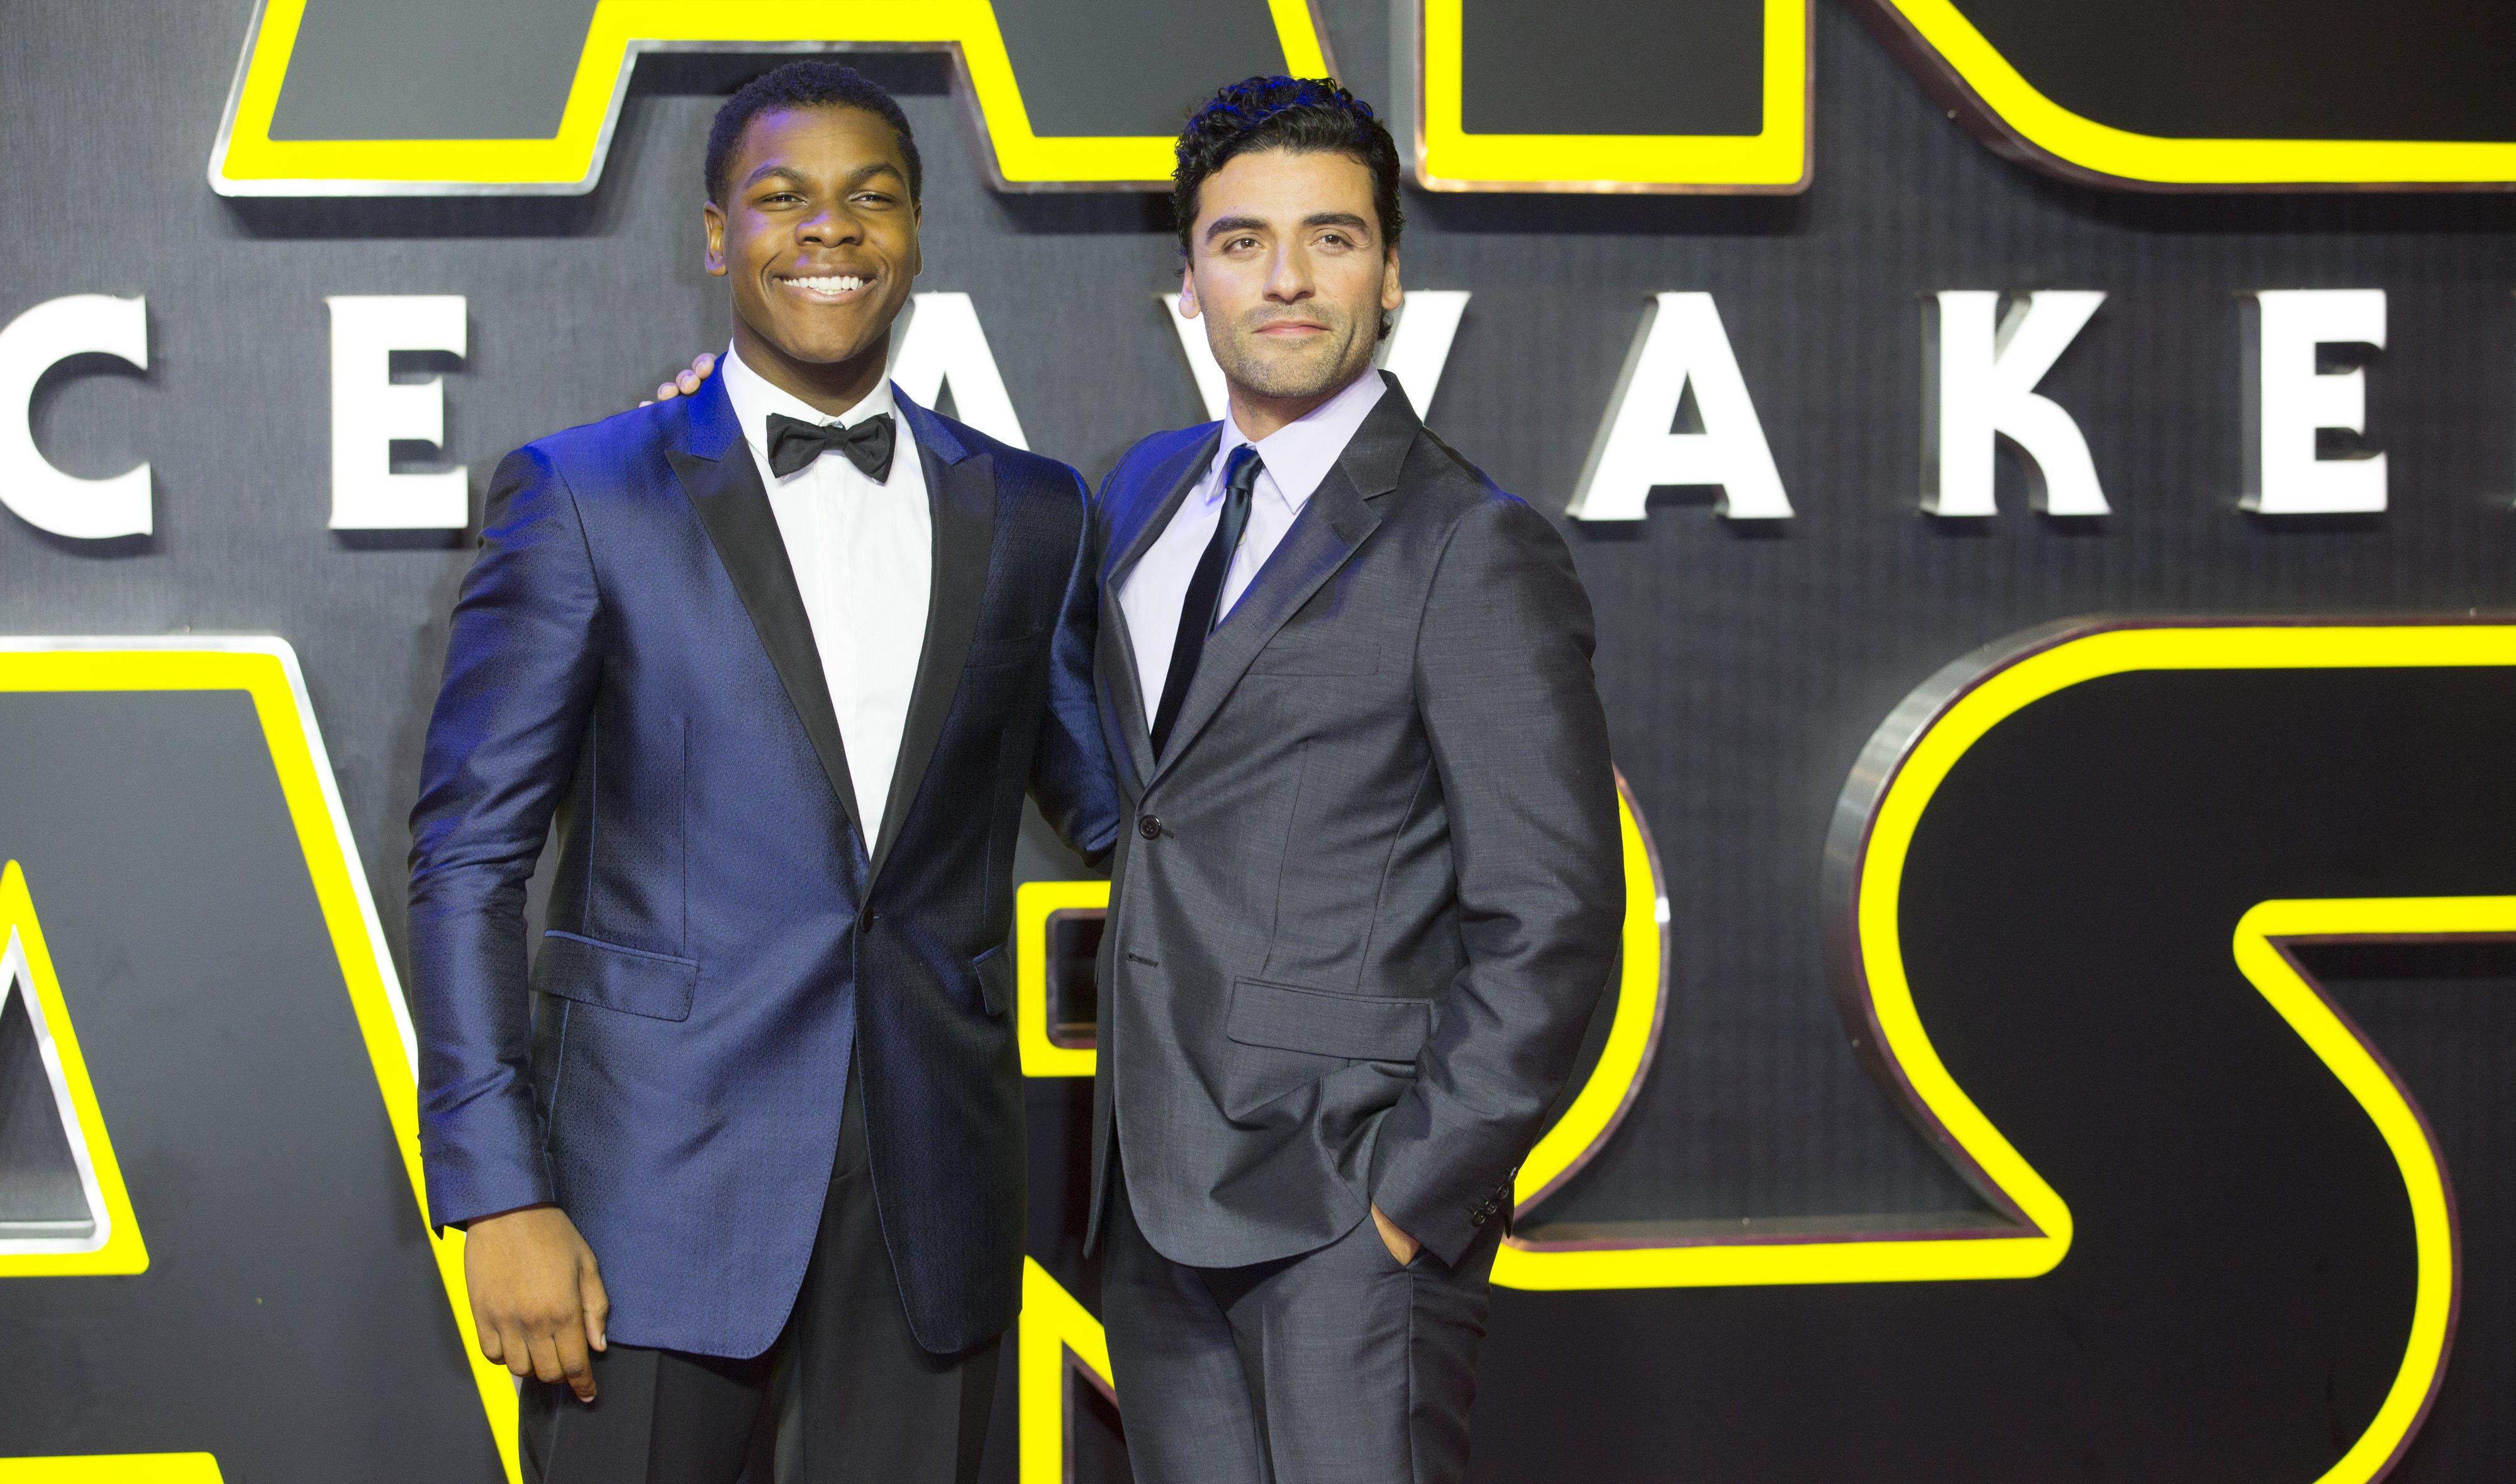 Star Wars'da Nihayet Eşcinsel Romantizmi Mi Göreceğiz?